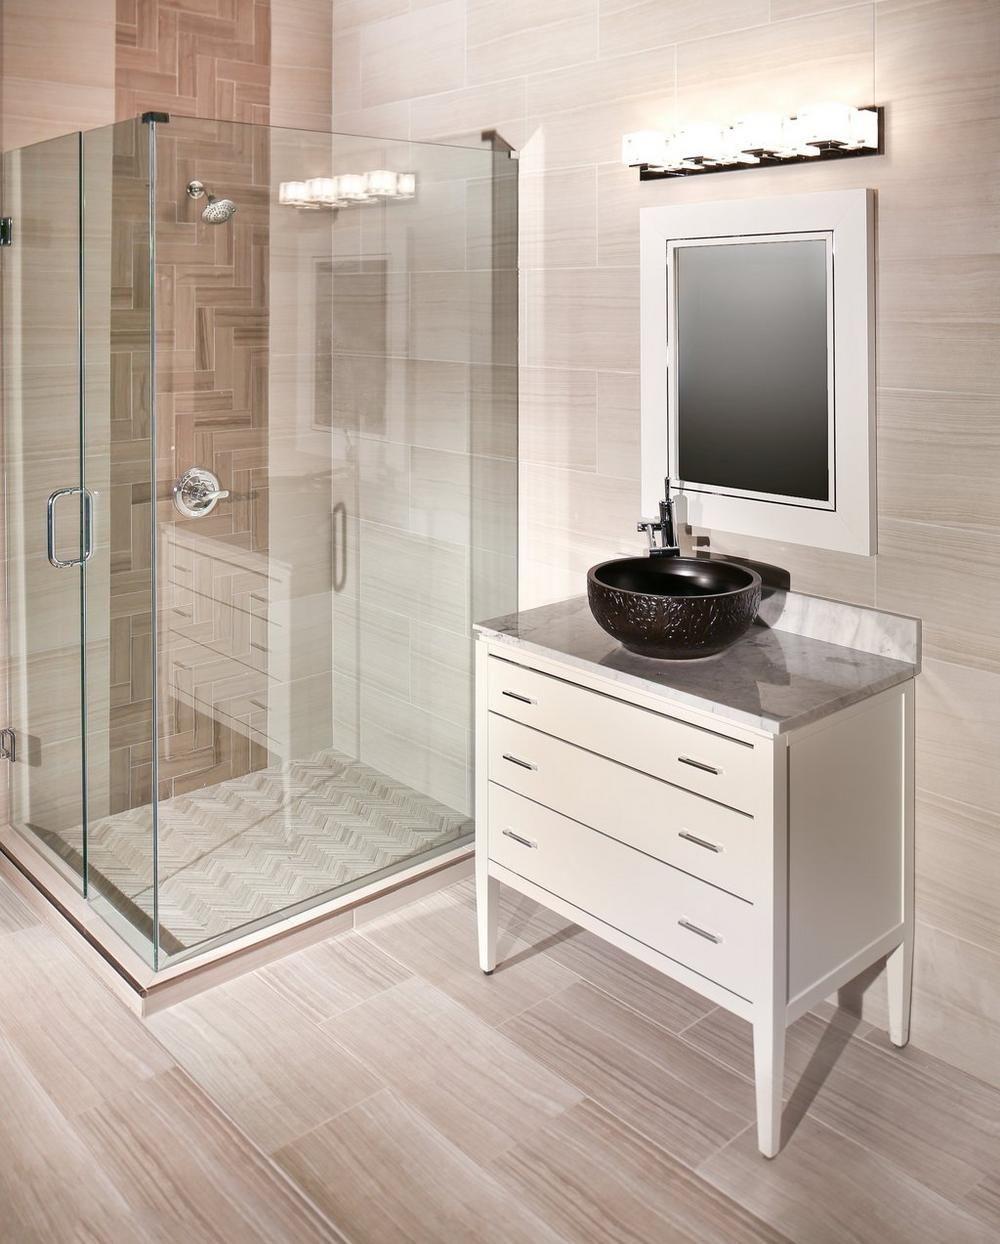 eramosa white porcelain tile 12 x 24 912102742 floor on floor and decor id=85426